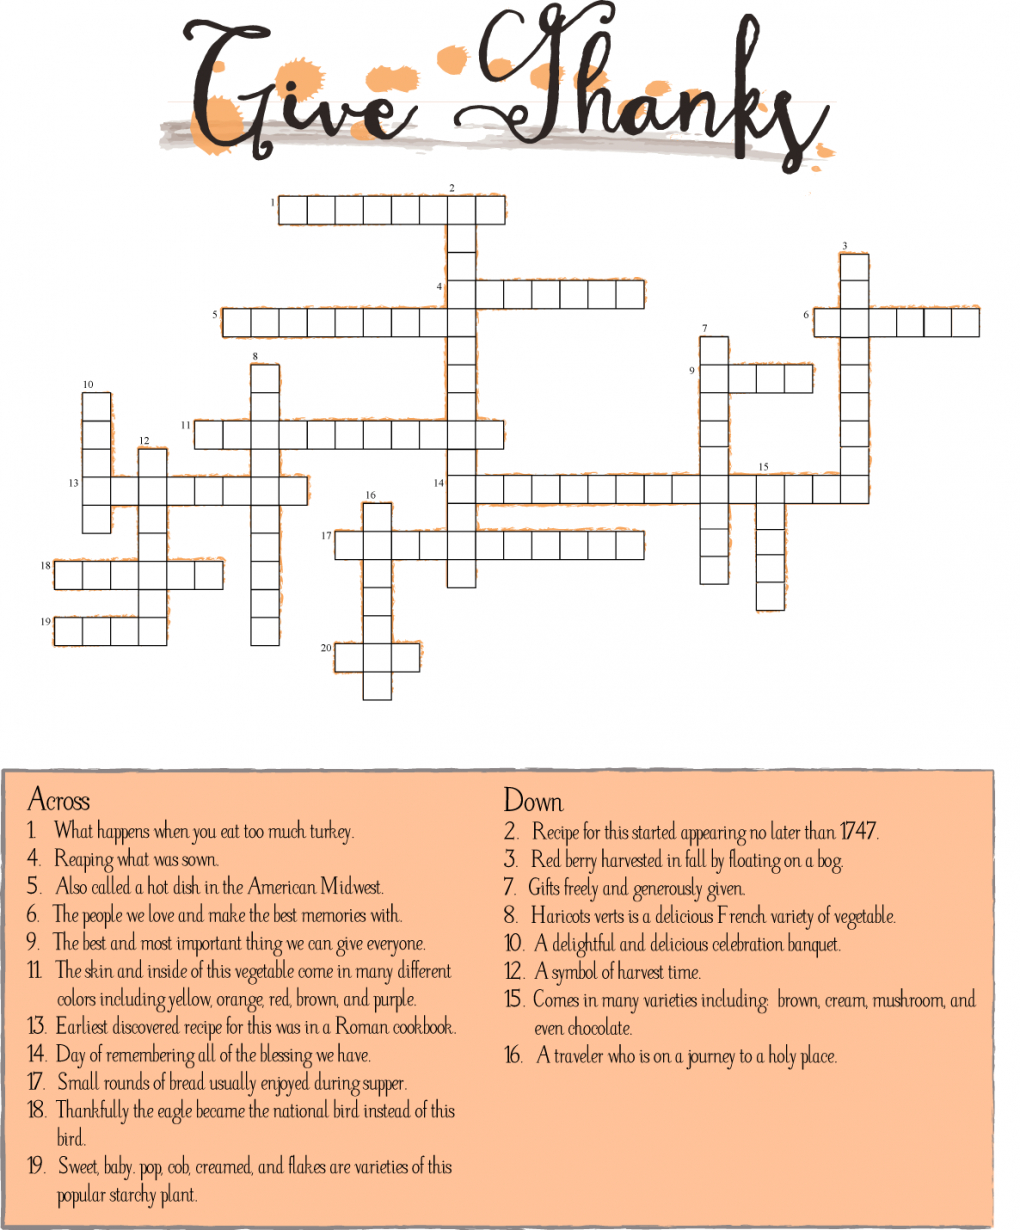 10 Superfun Thanksgiving Crossword Puzzles | Kittybabylove - Printable Thanksgiving Crossword Puzzles